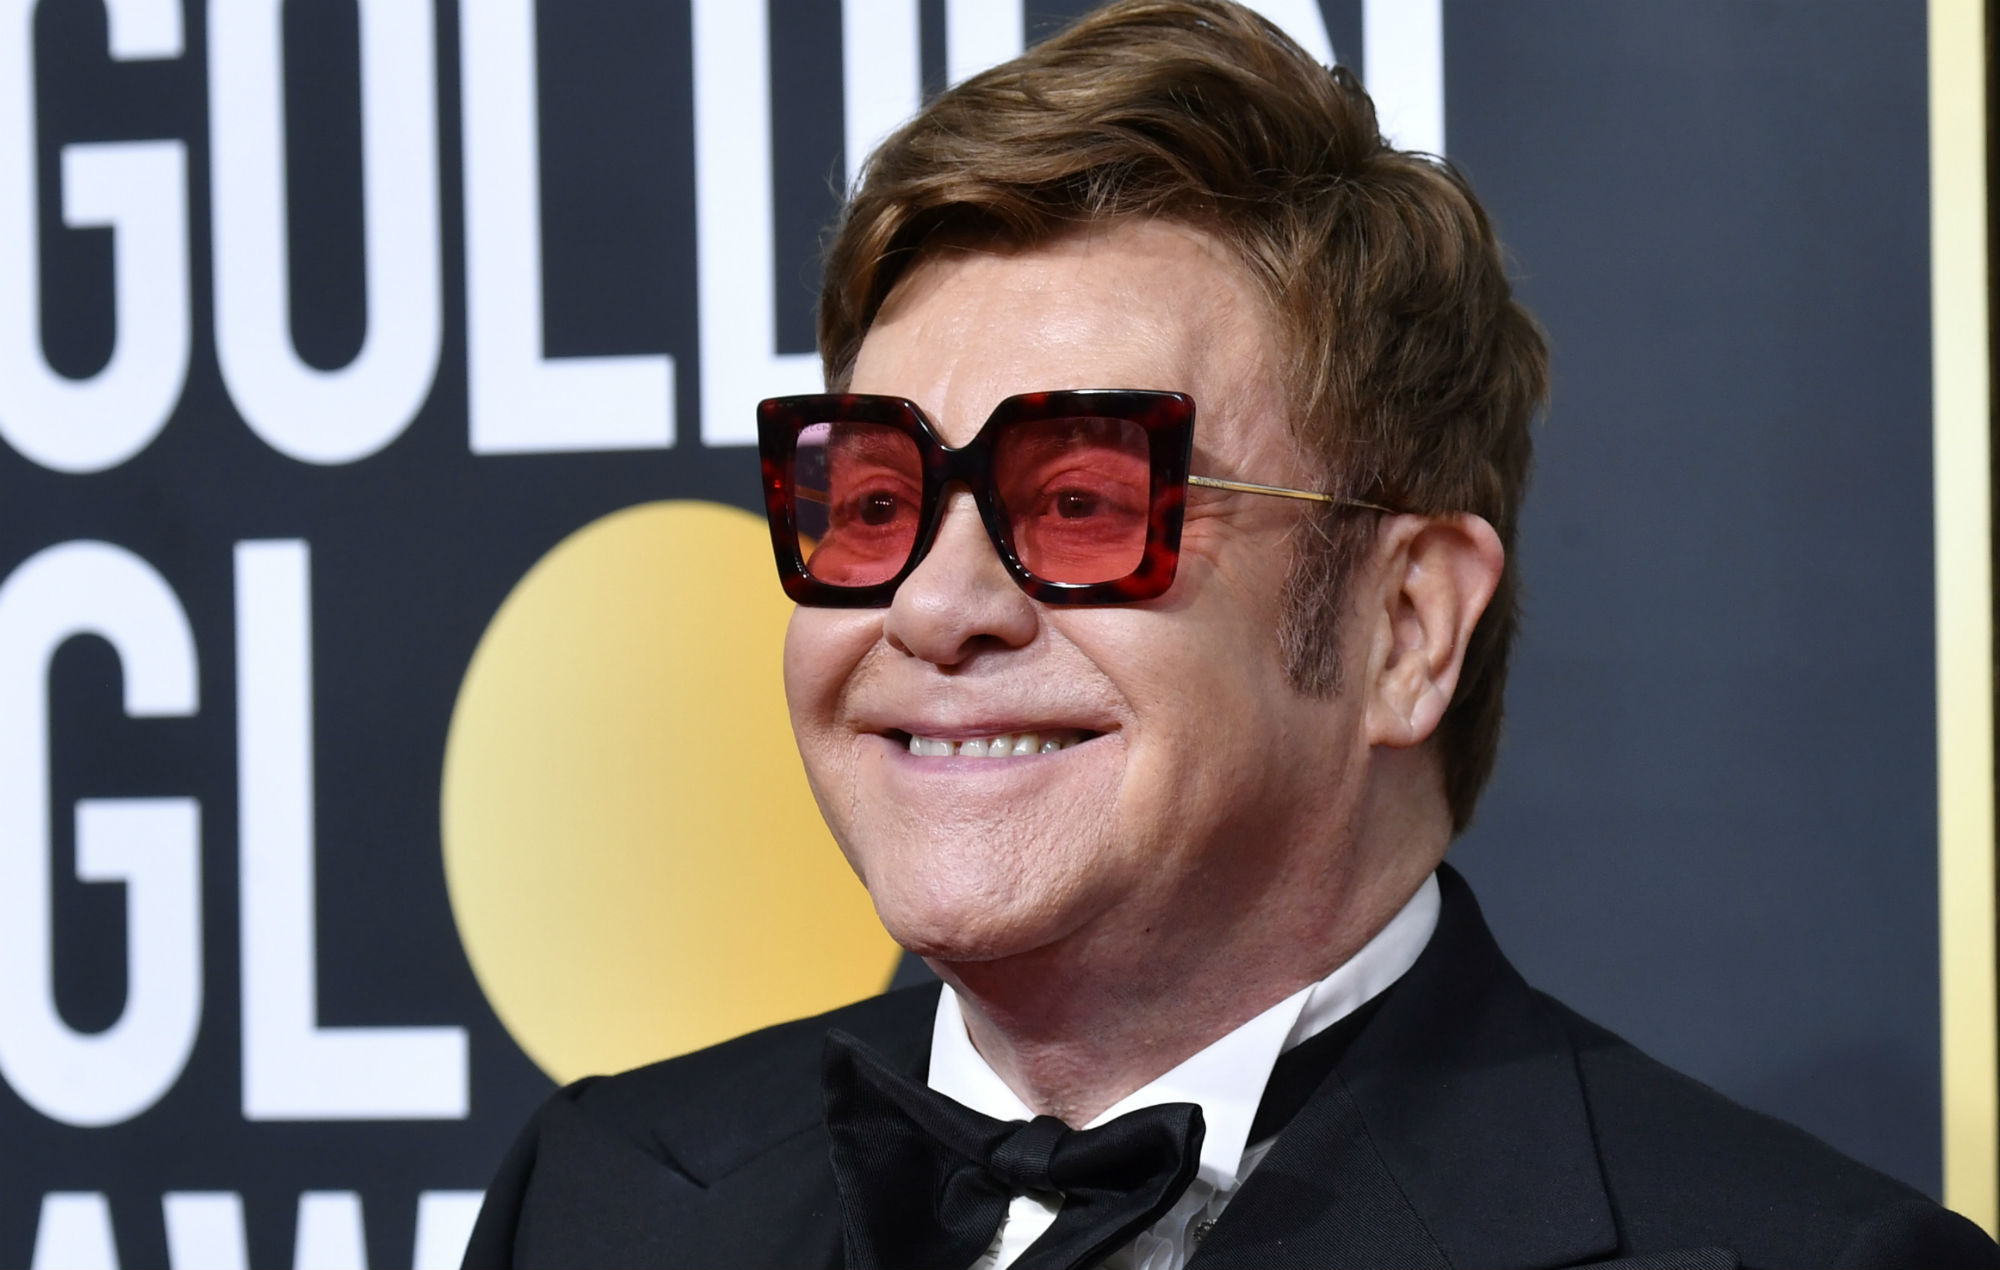 Sam Fender and Rina Sawayama to carry out on Elton John's World AIDS Day live-stream tonight